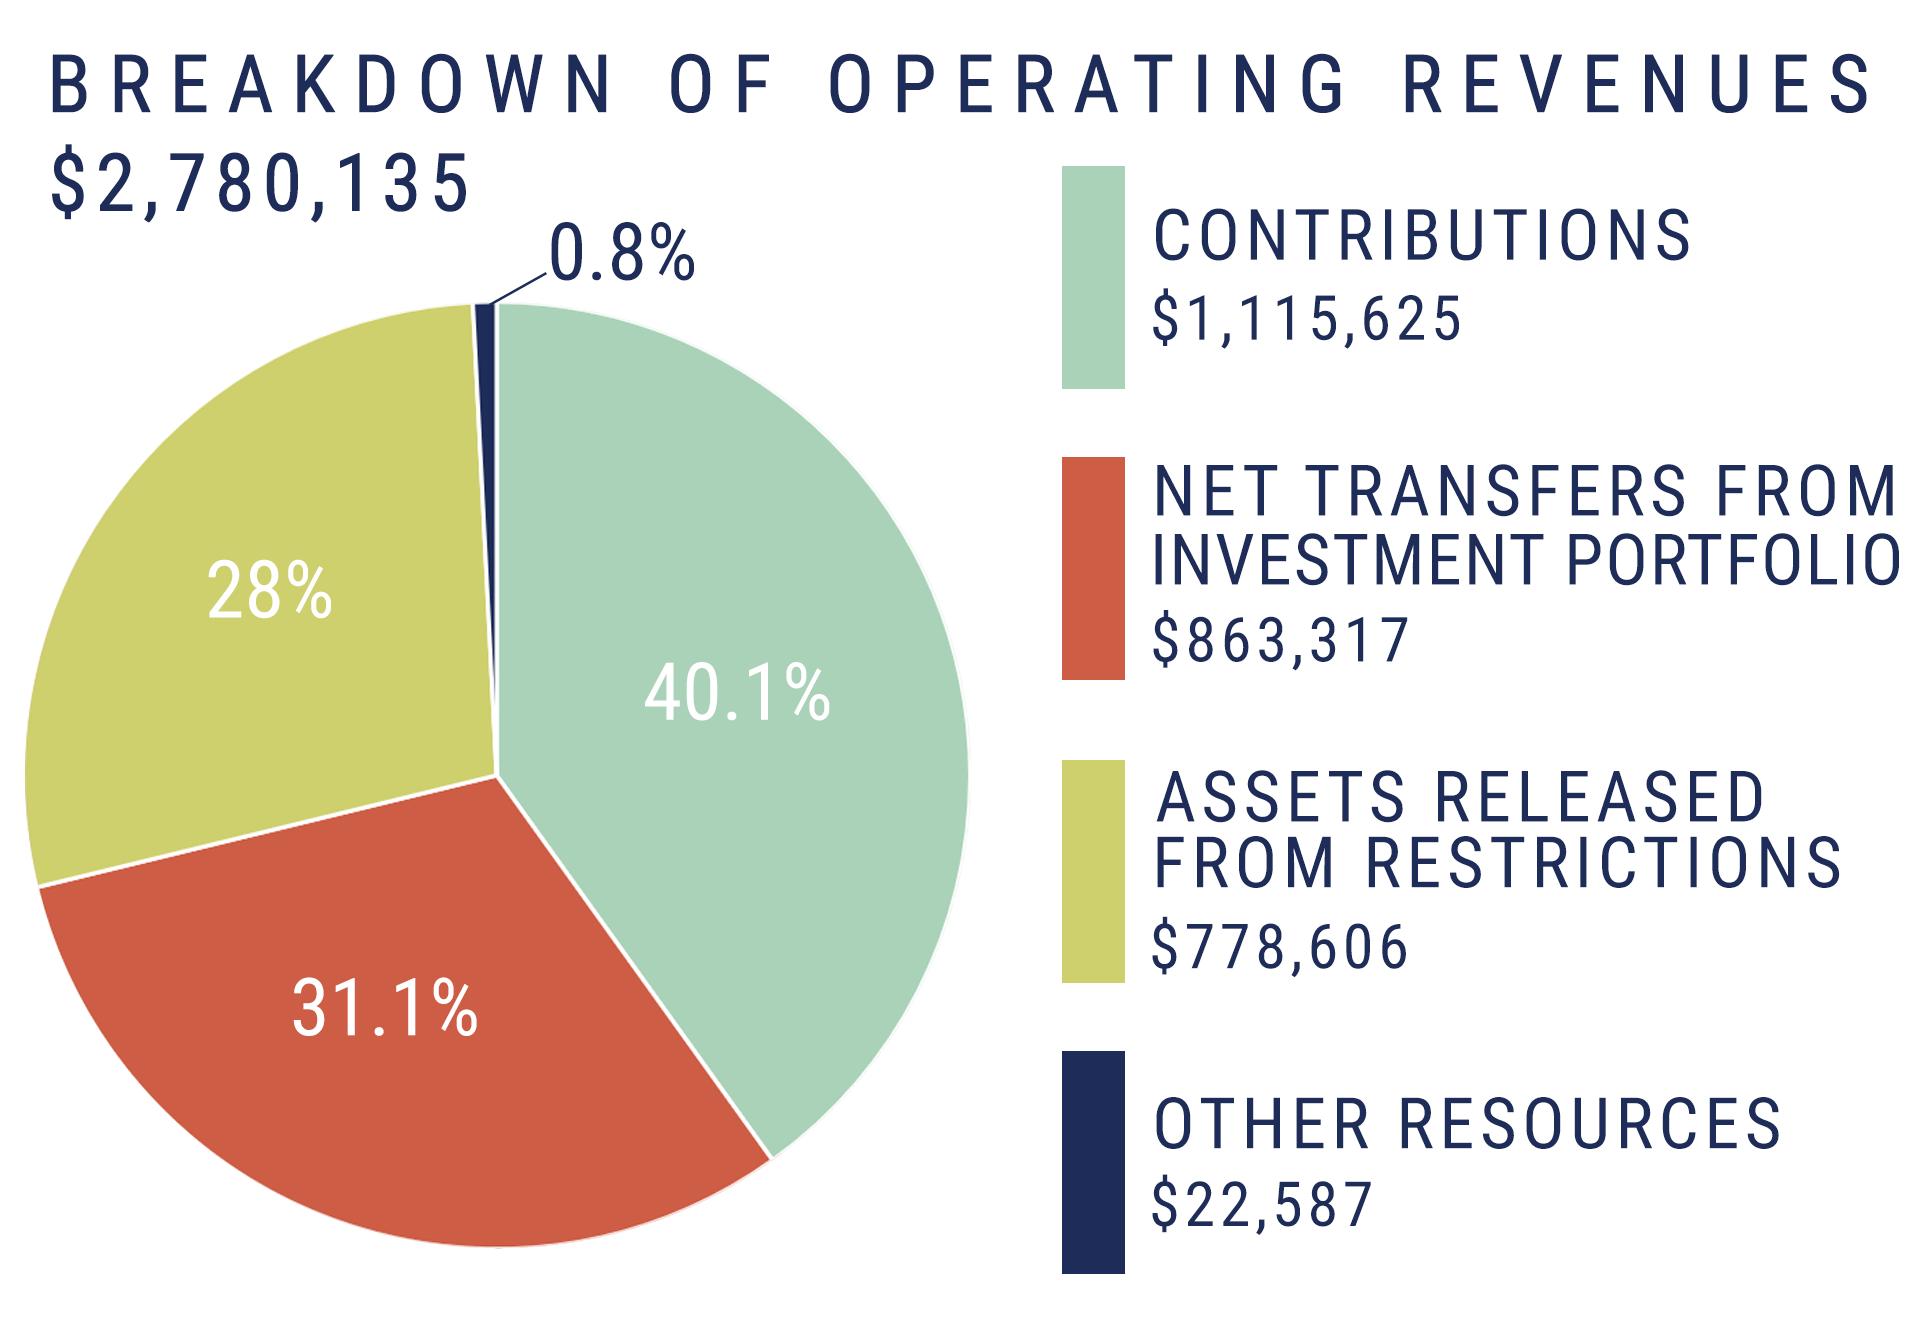 pie-chart_breakdown-of-operating-revenues2020